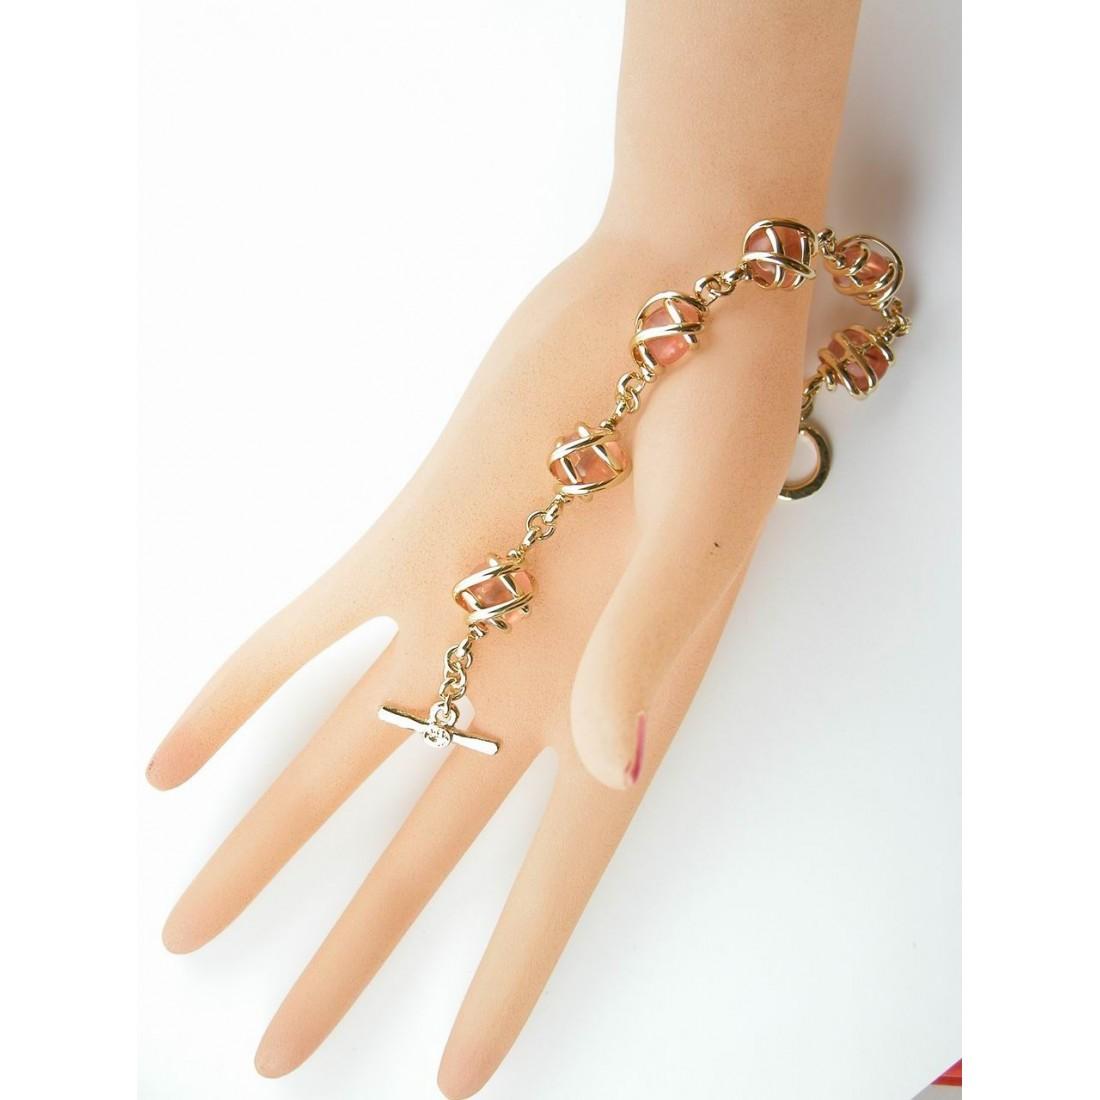 Artisanat d'art-bracelet fait main